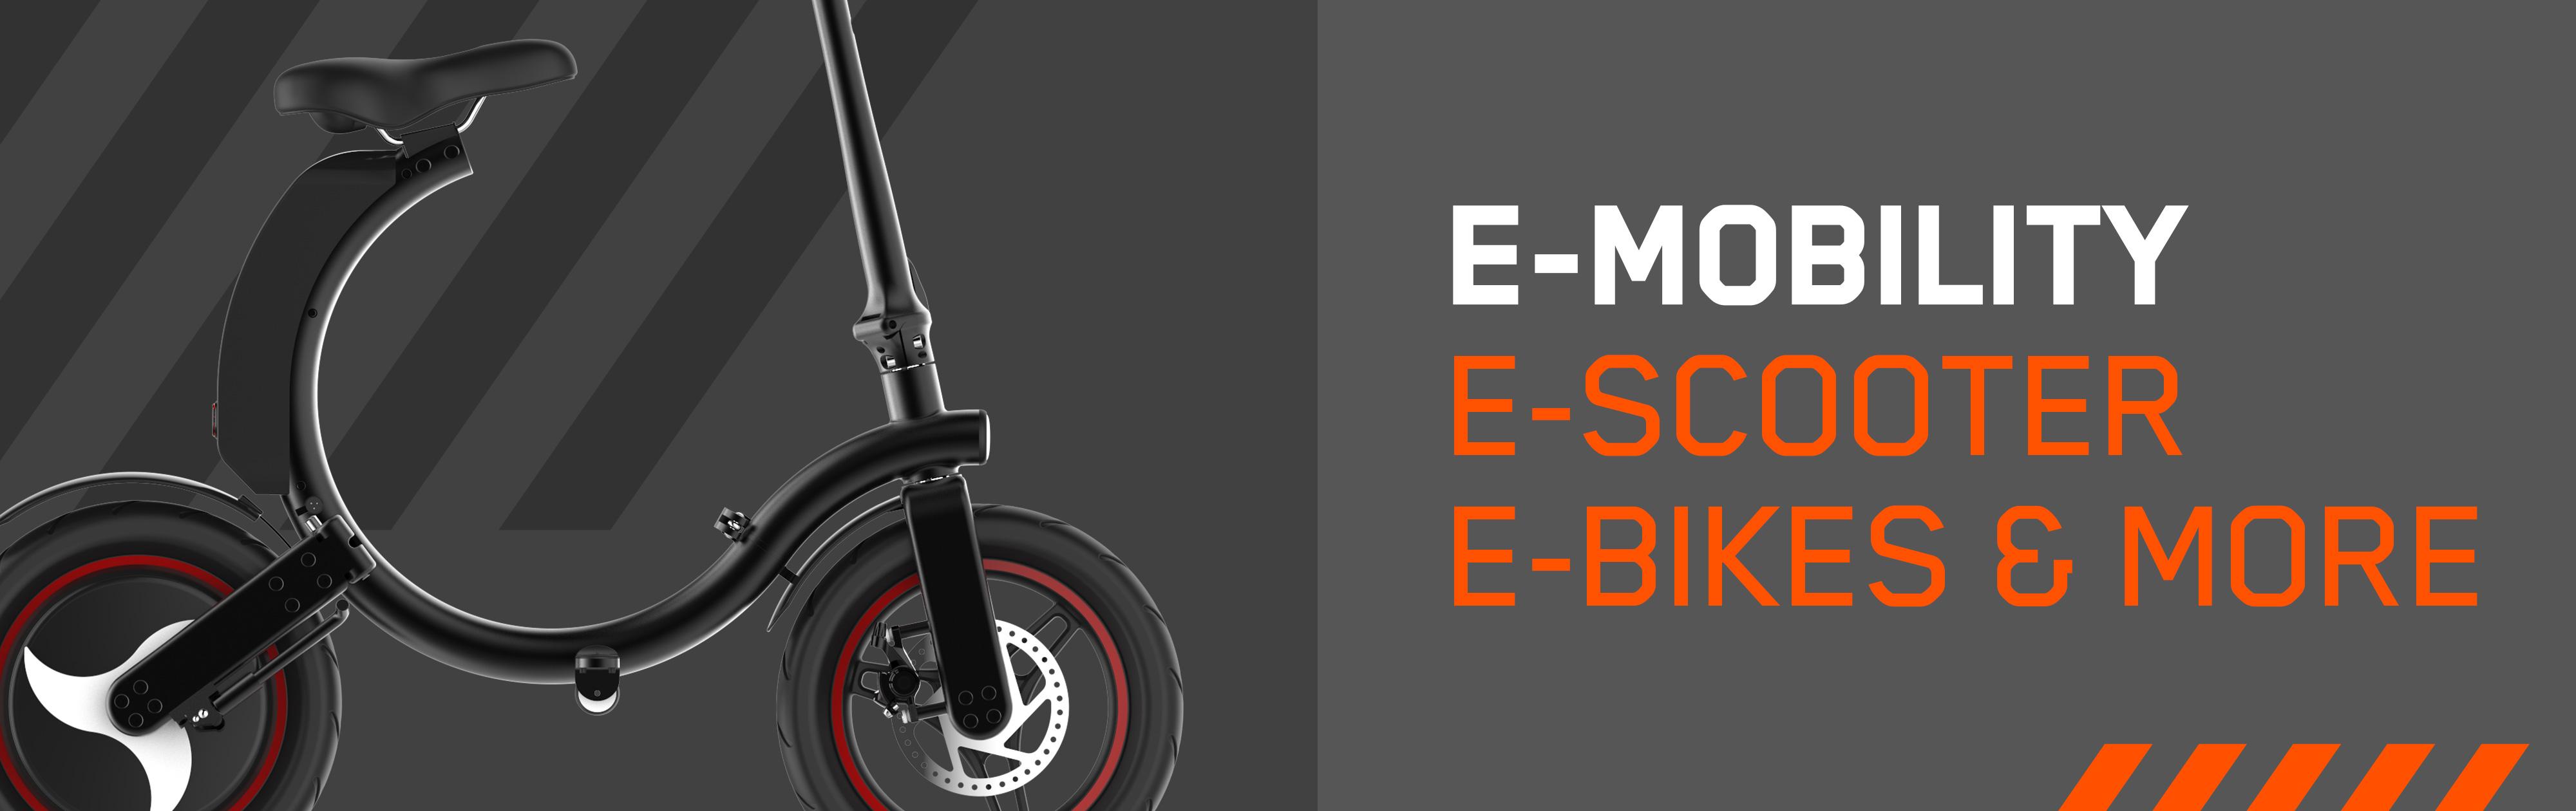 Modster-Emobility-kaufen